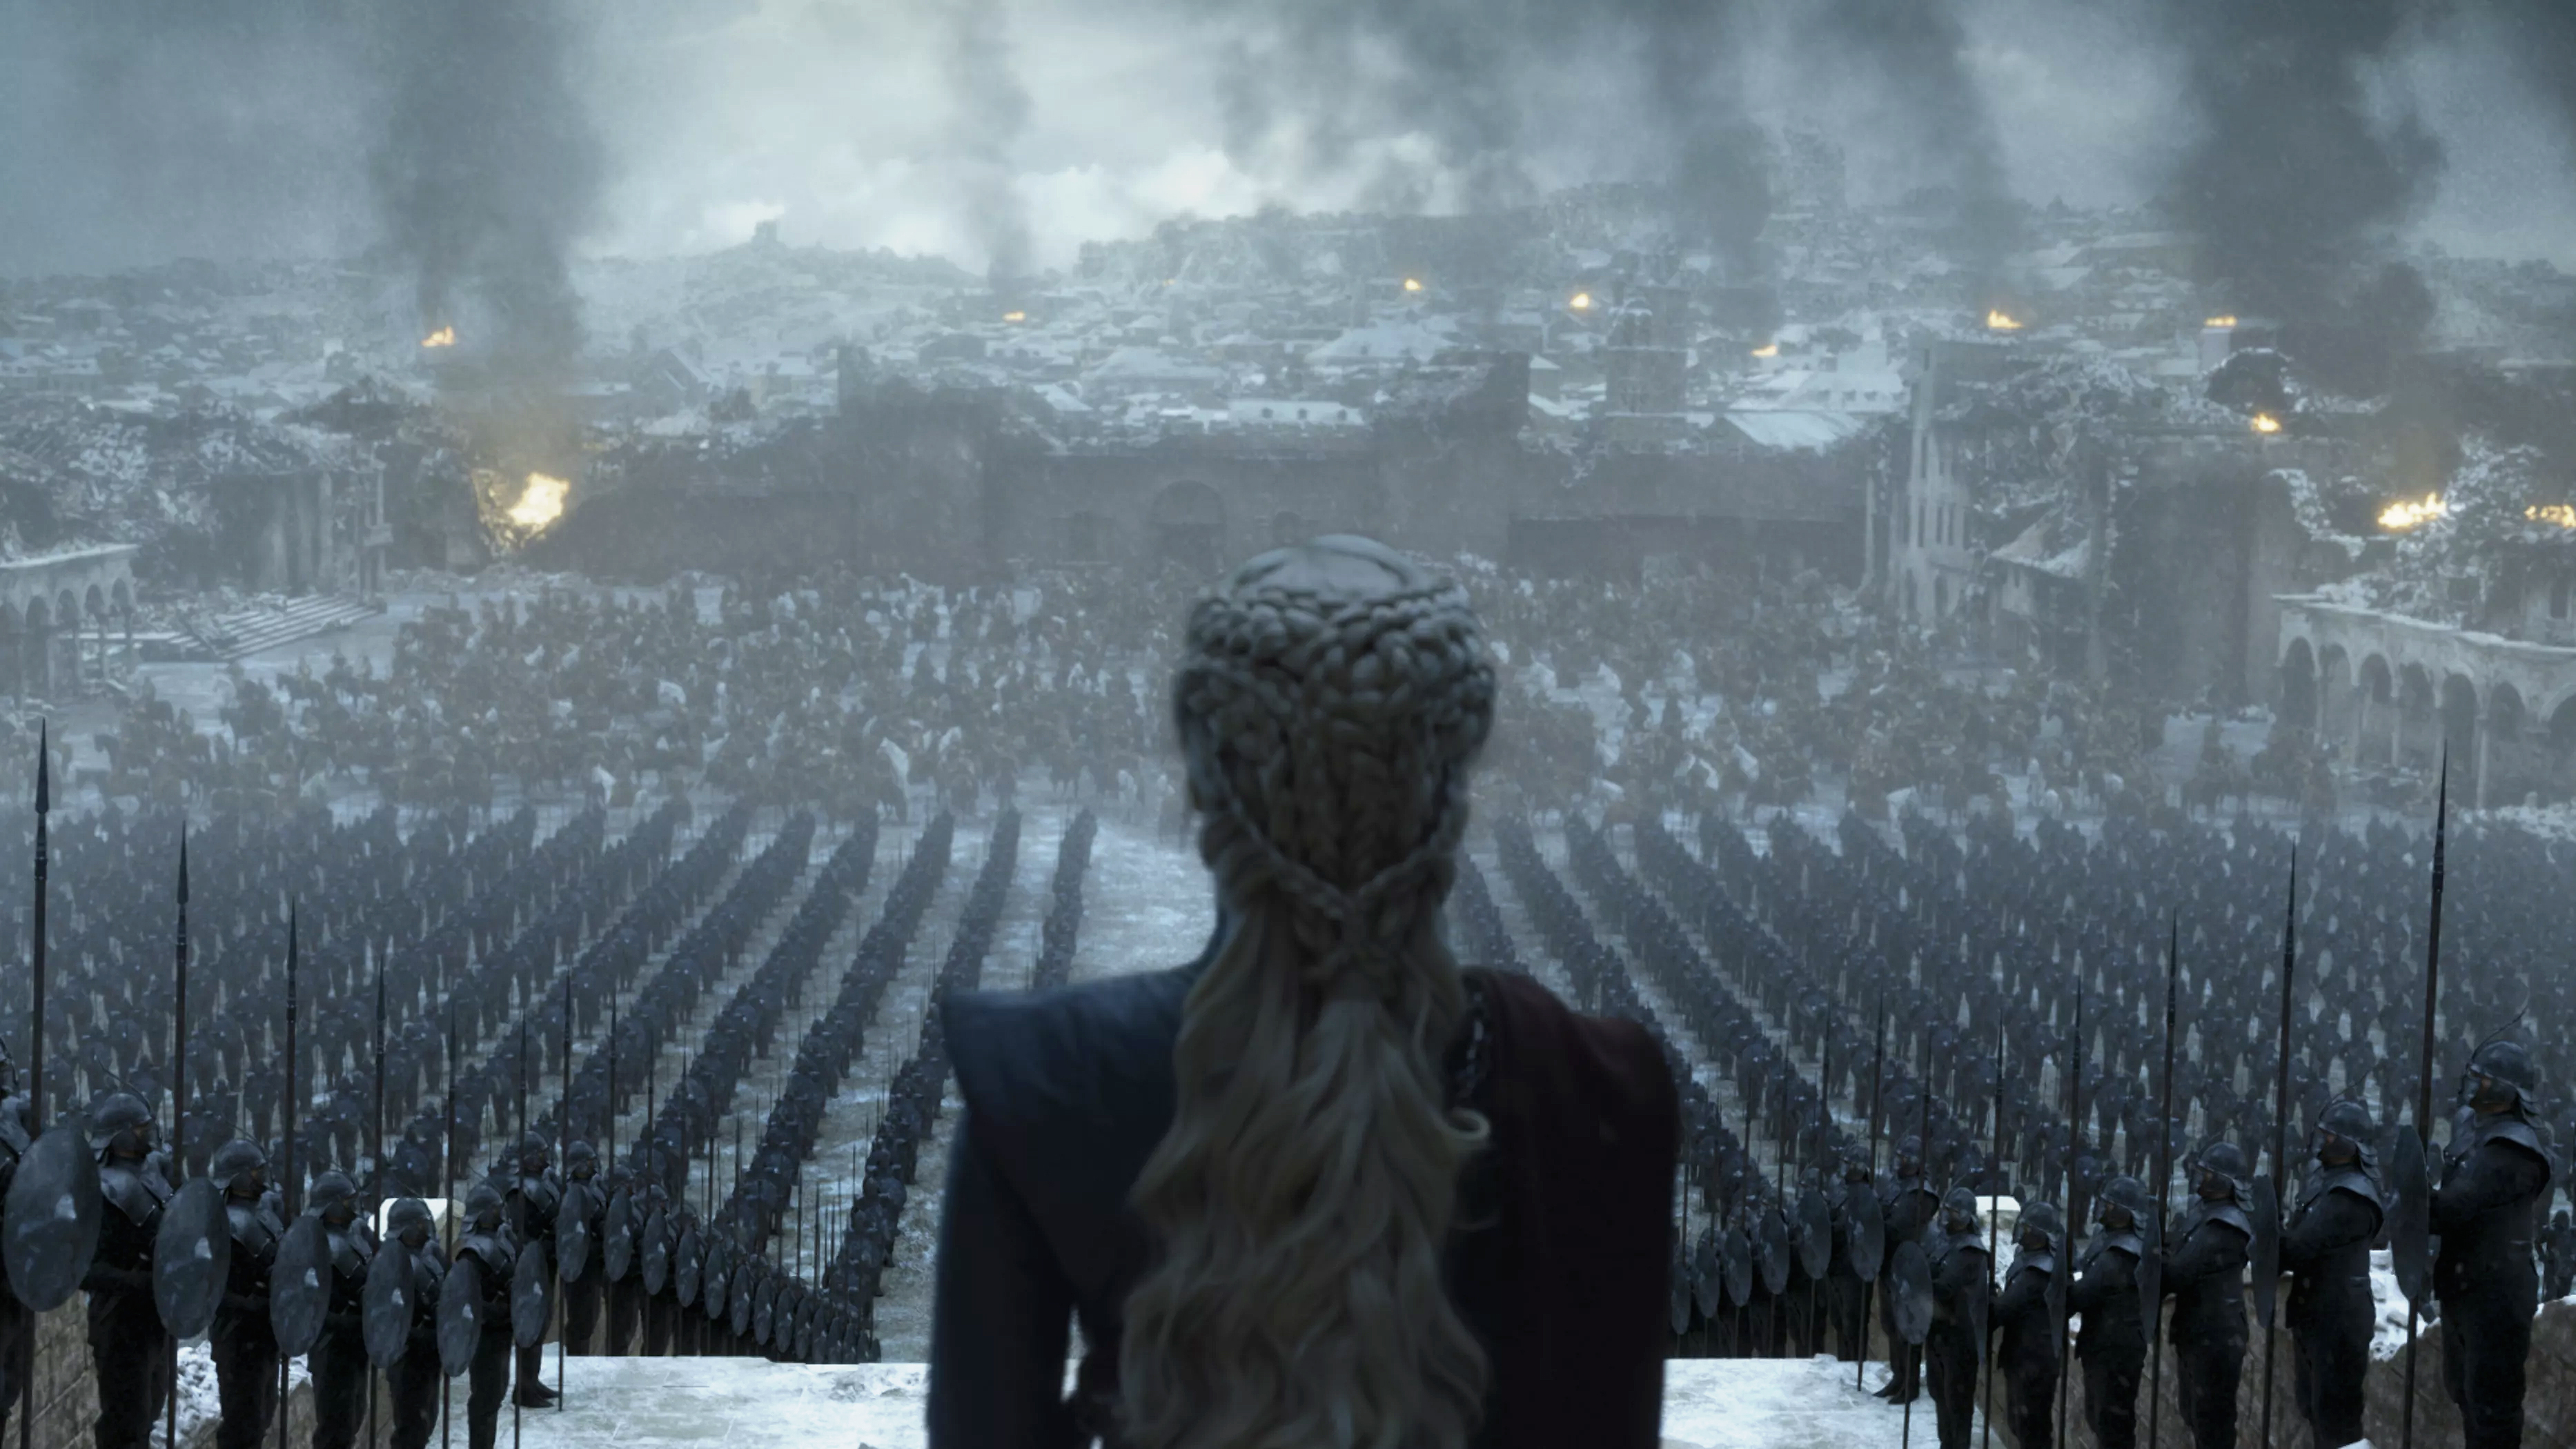 8x06 - The Iron Throne - Daenerys